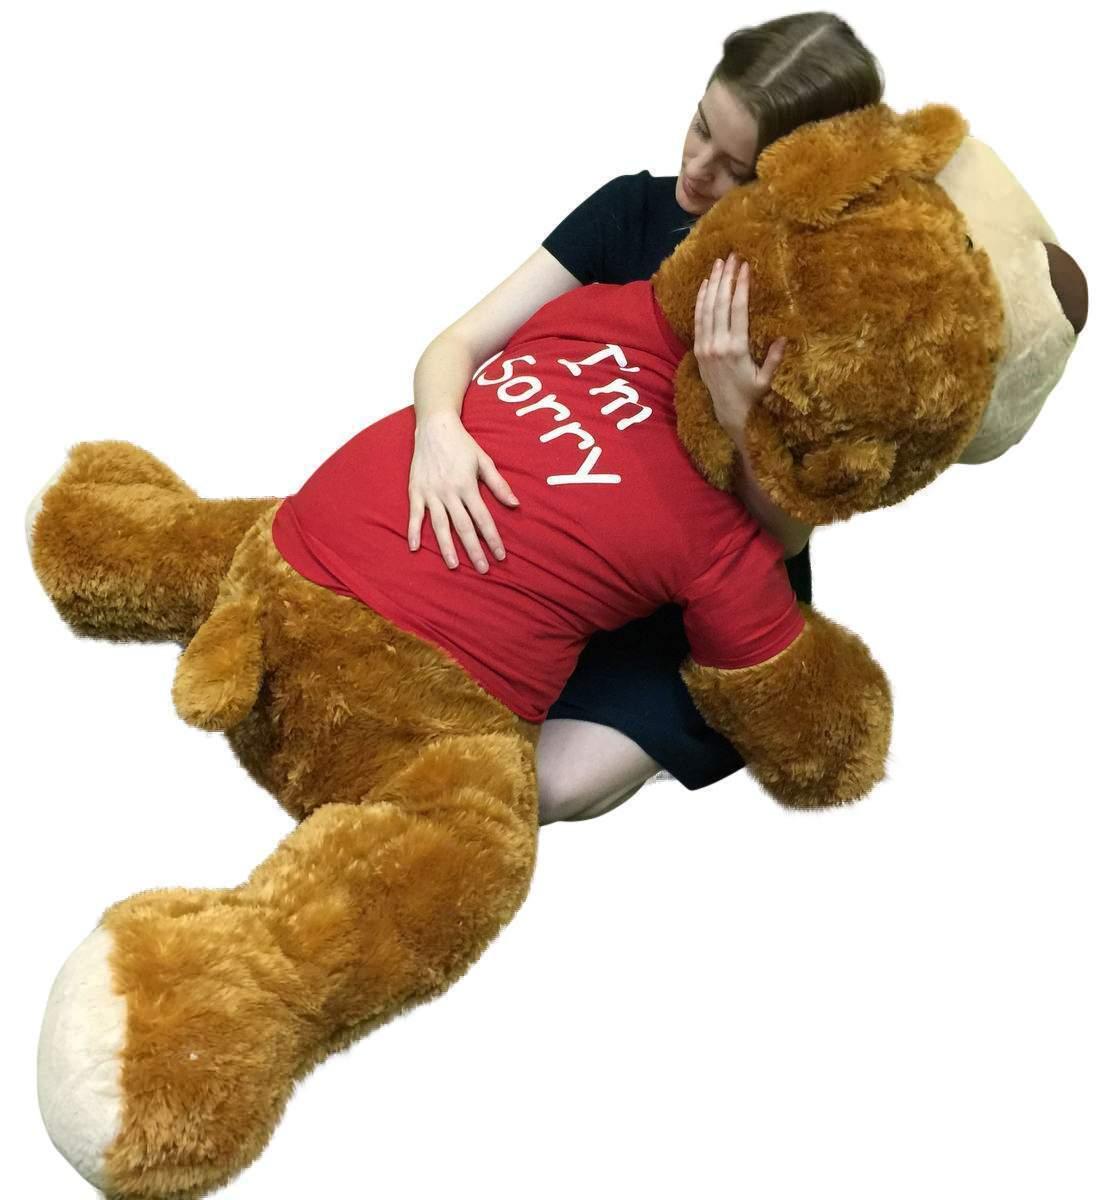 I'm Sorry Giant Stuffed Puppy Dog 5 Feet Long Long Feet Braun Soft Wears I'M SORRY T-shirt 1db326